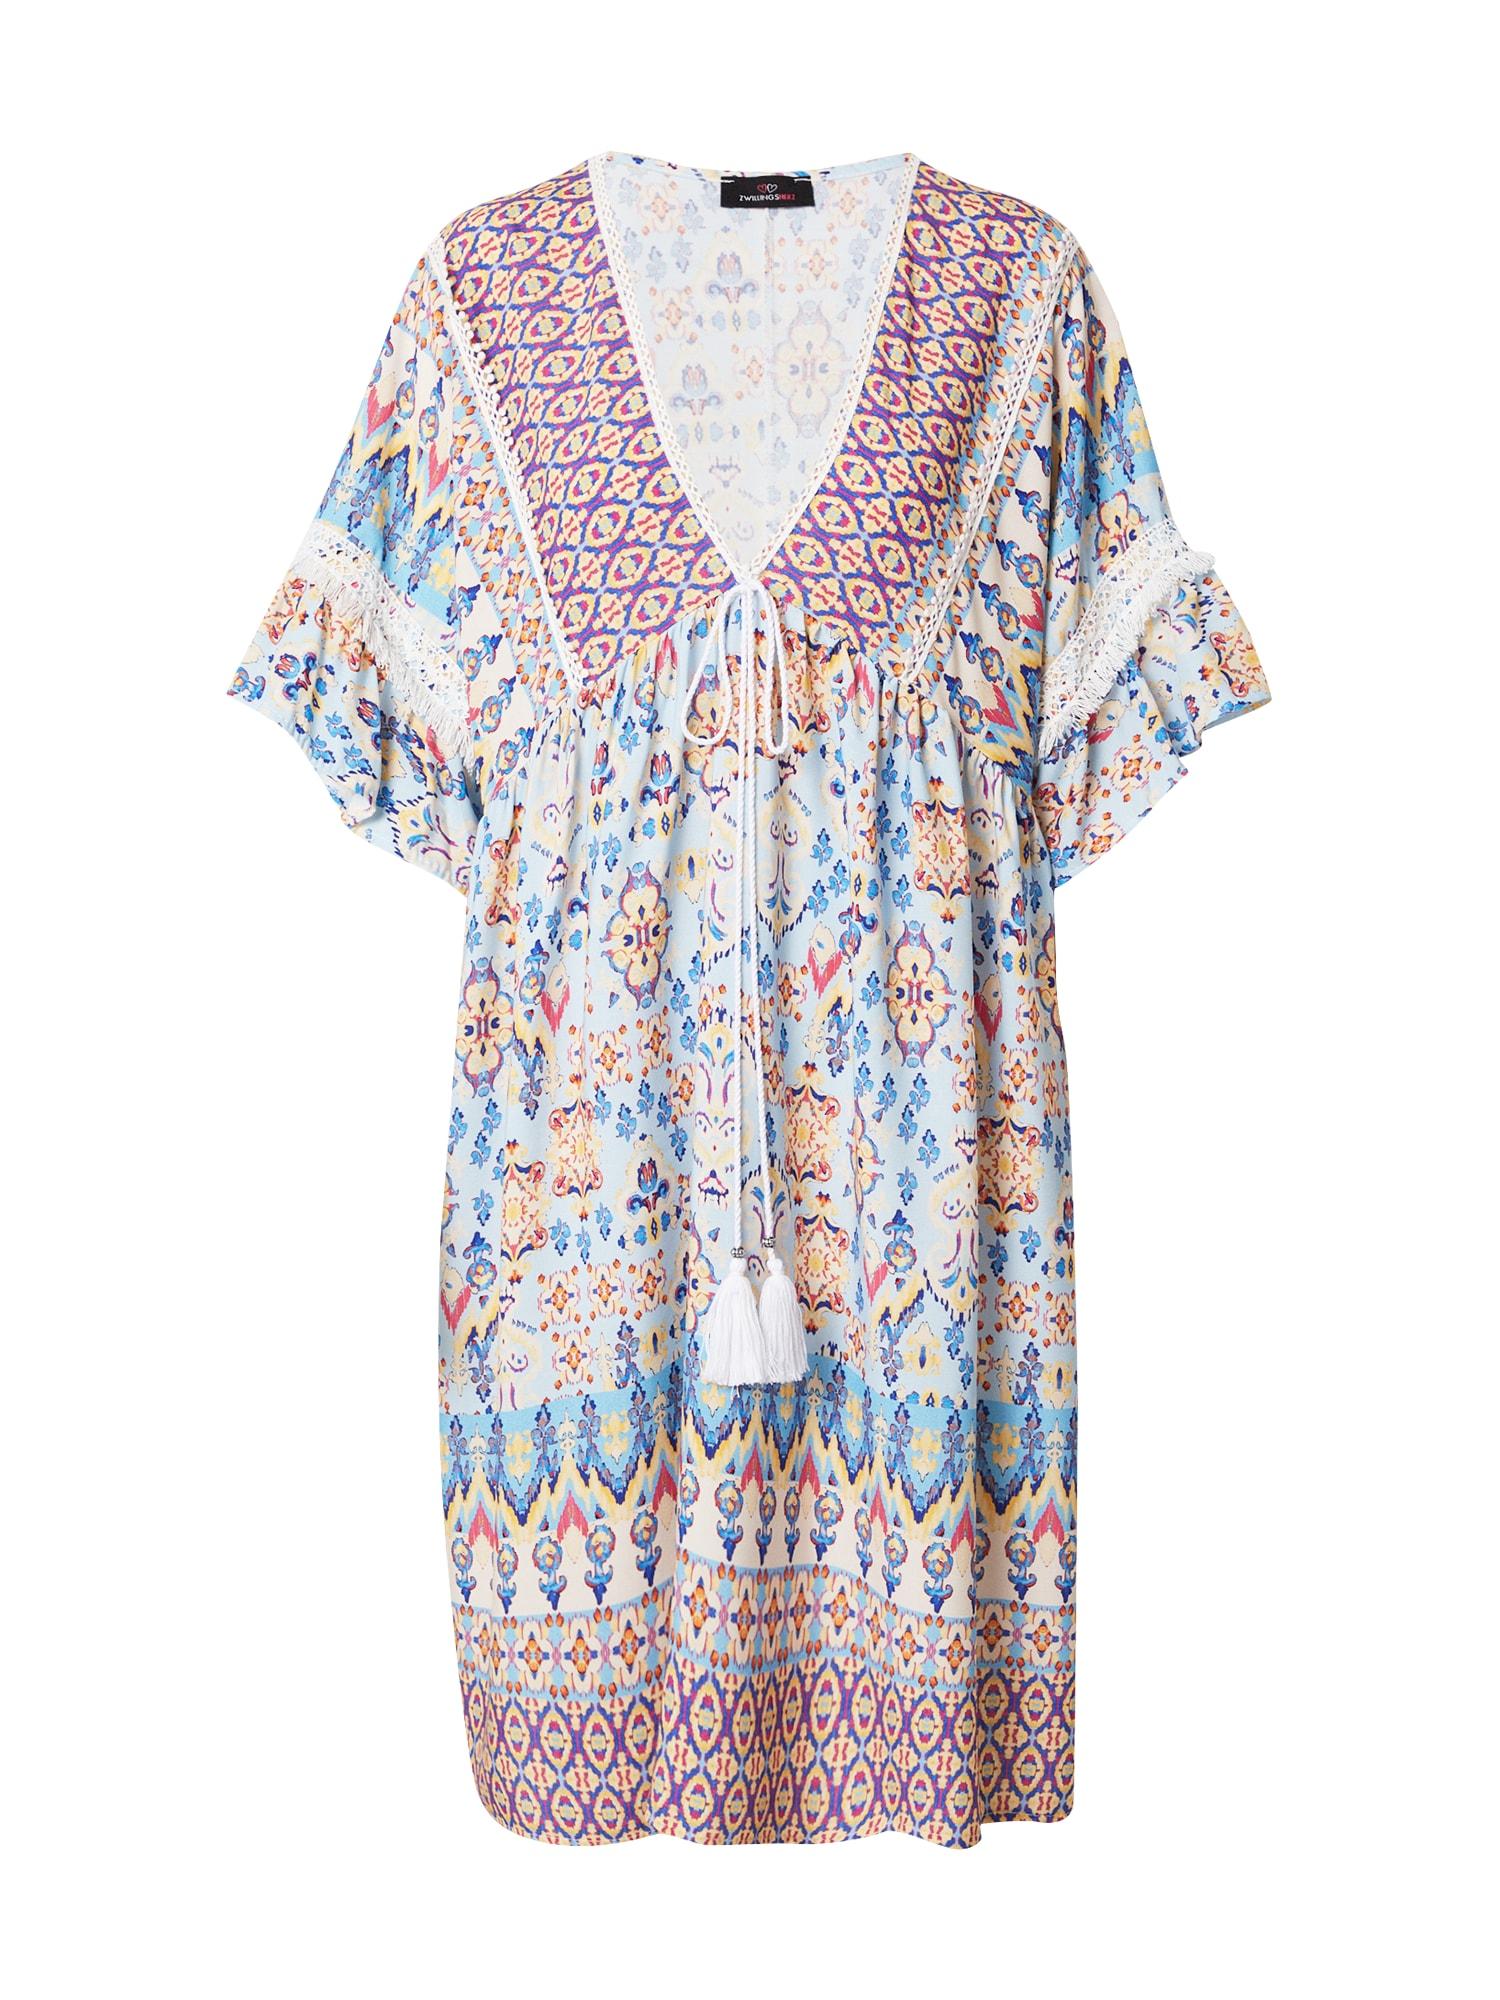 Zwillingsherz Paplūdimio suknelė 'Mina' mėlyna / mišrios spalvos